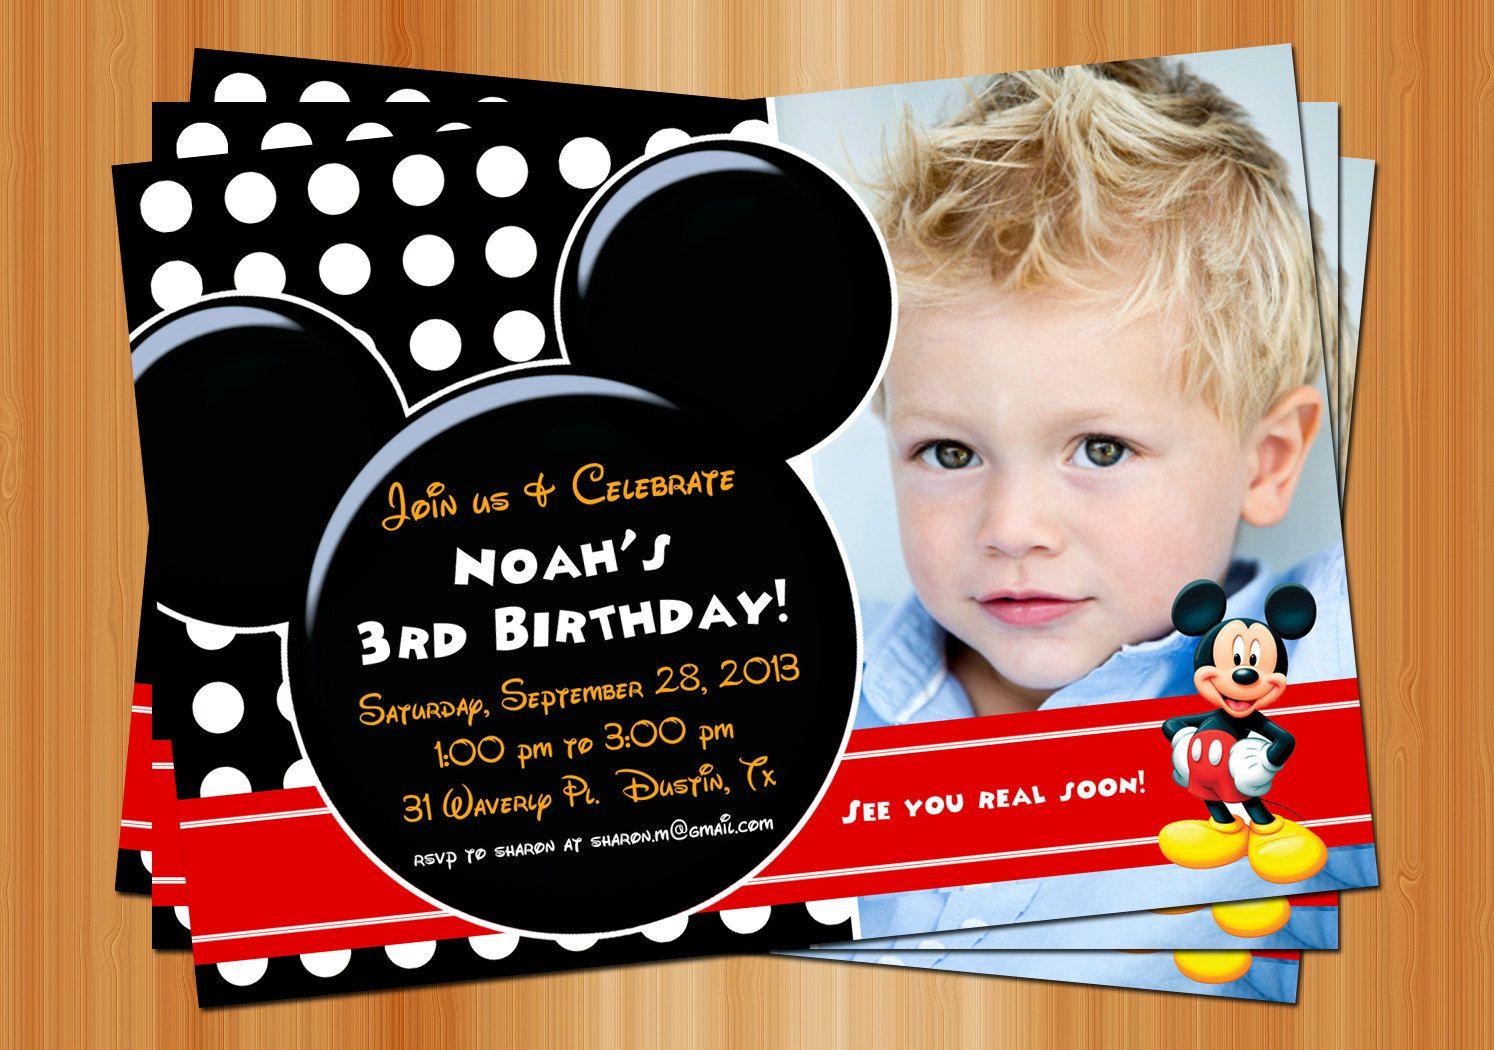 Mickey mouse birthday invitation printable by theolivepresspaper mickey mouse birthday invitation printable by theolivepresspaper filmwisefo Gallery